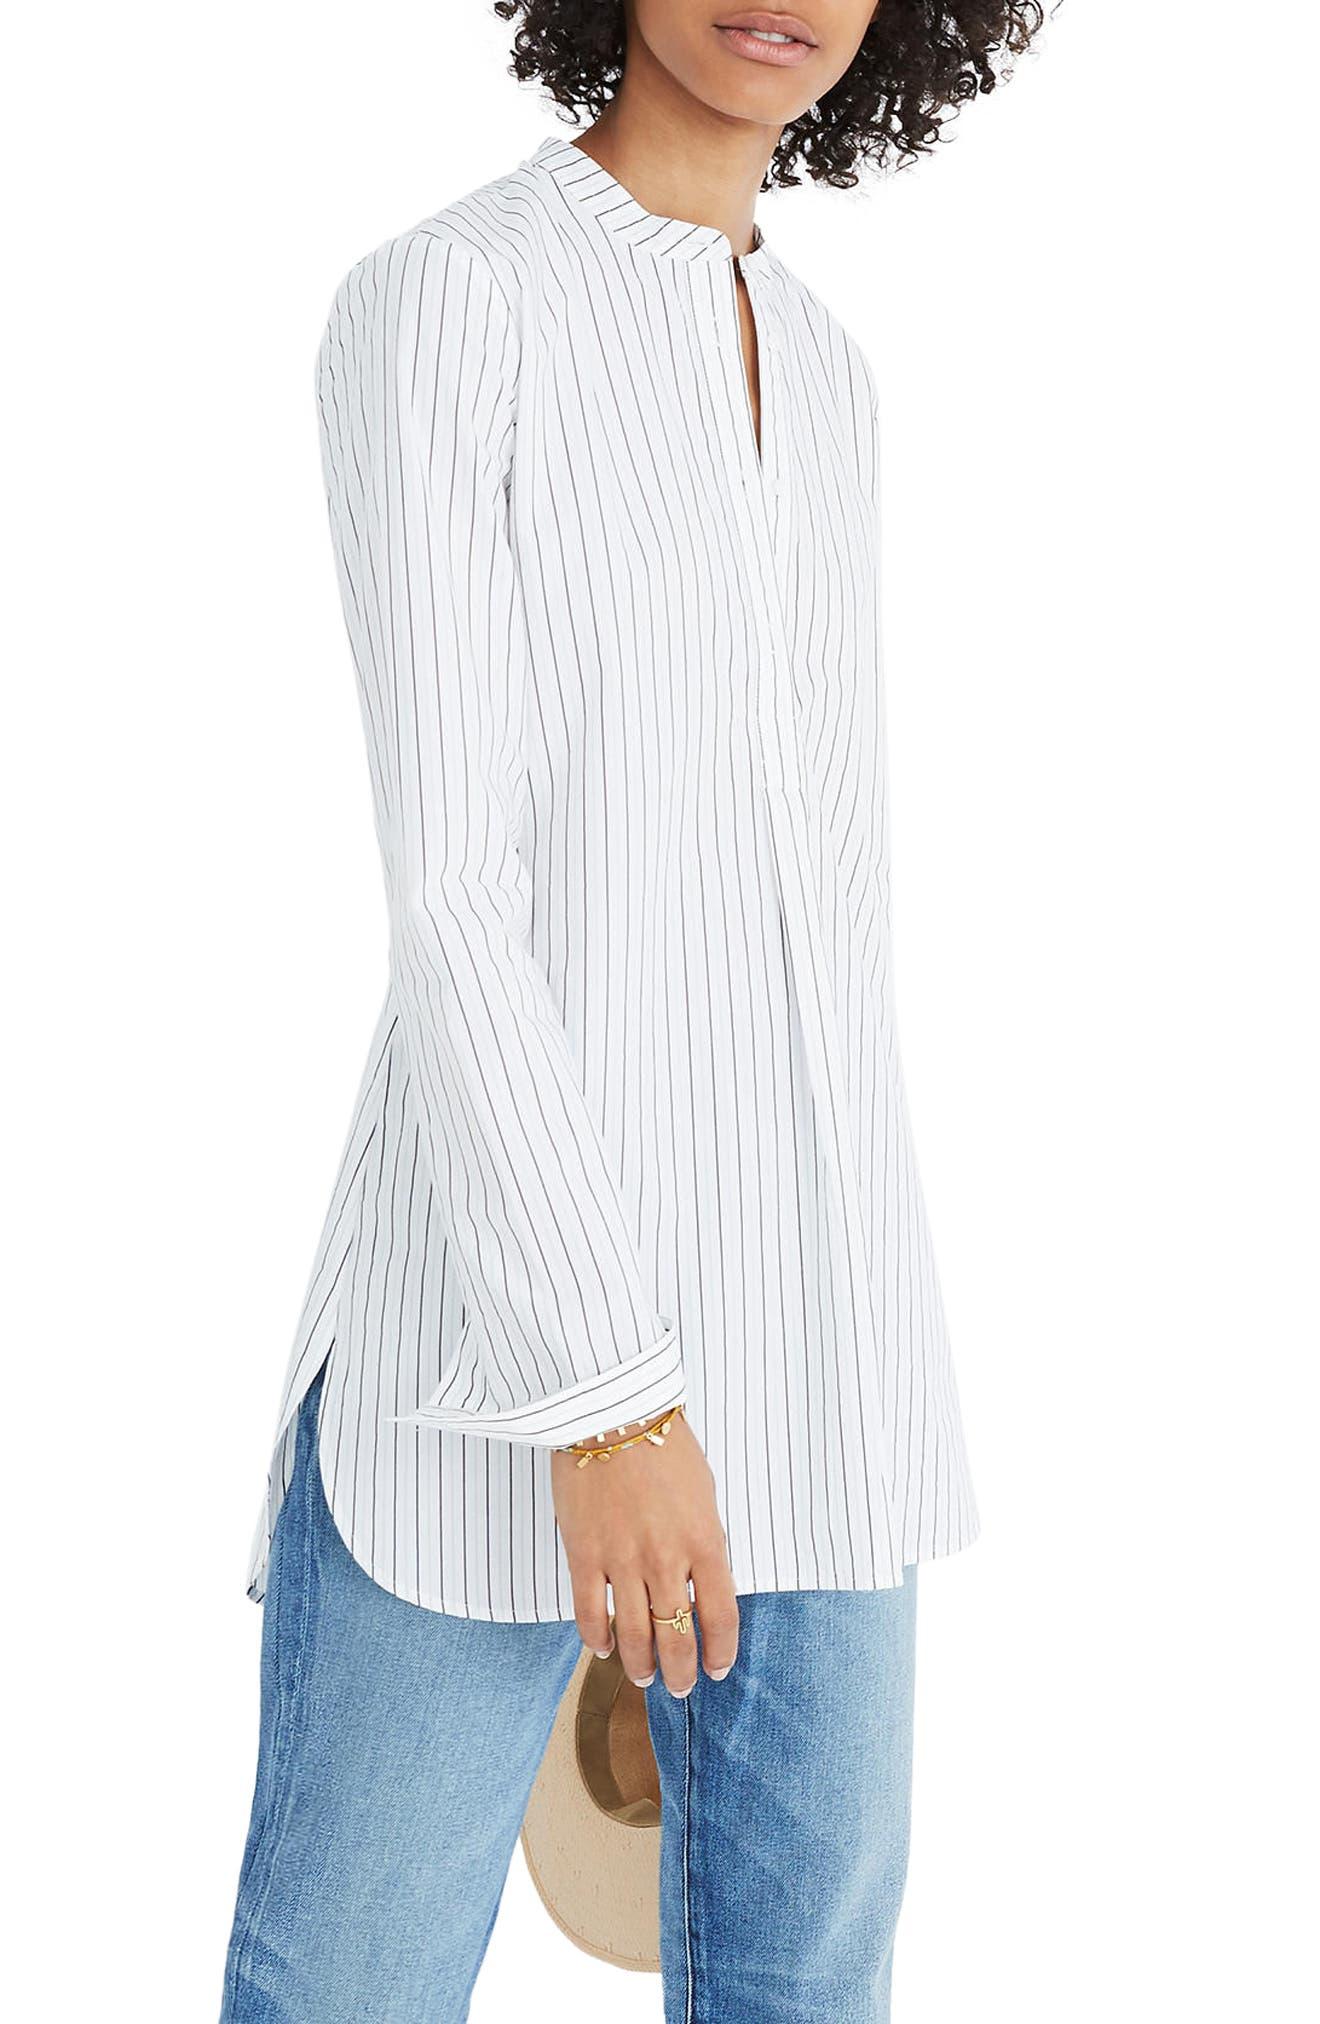 Wellspring Stripe Tunic Popover Shirt,                         Main,                         color, White Wash